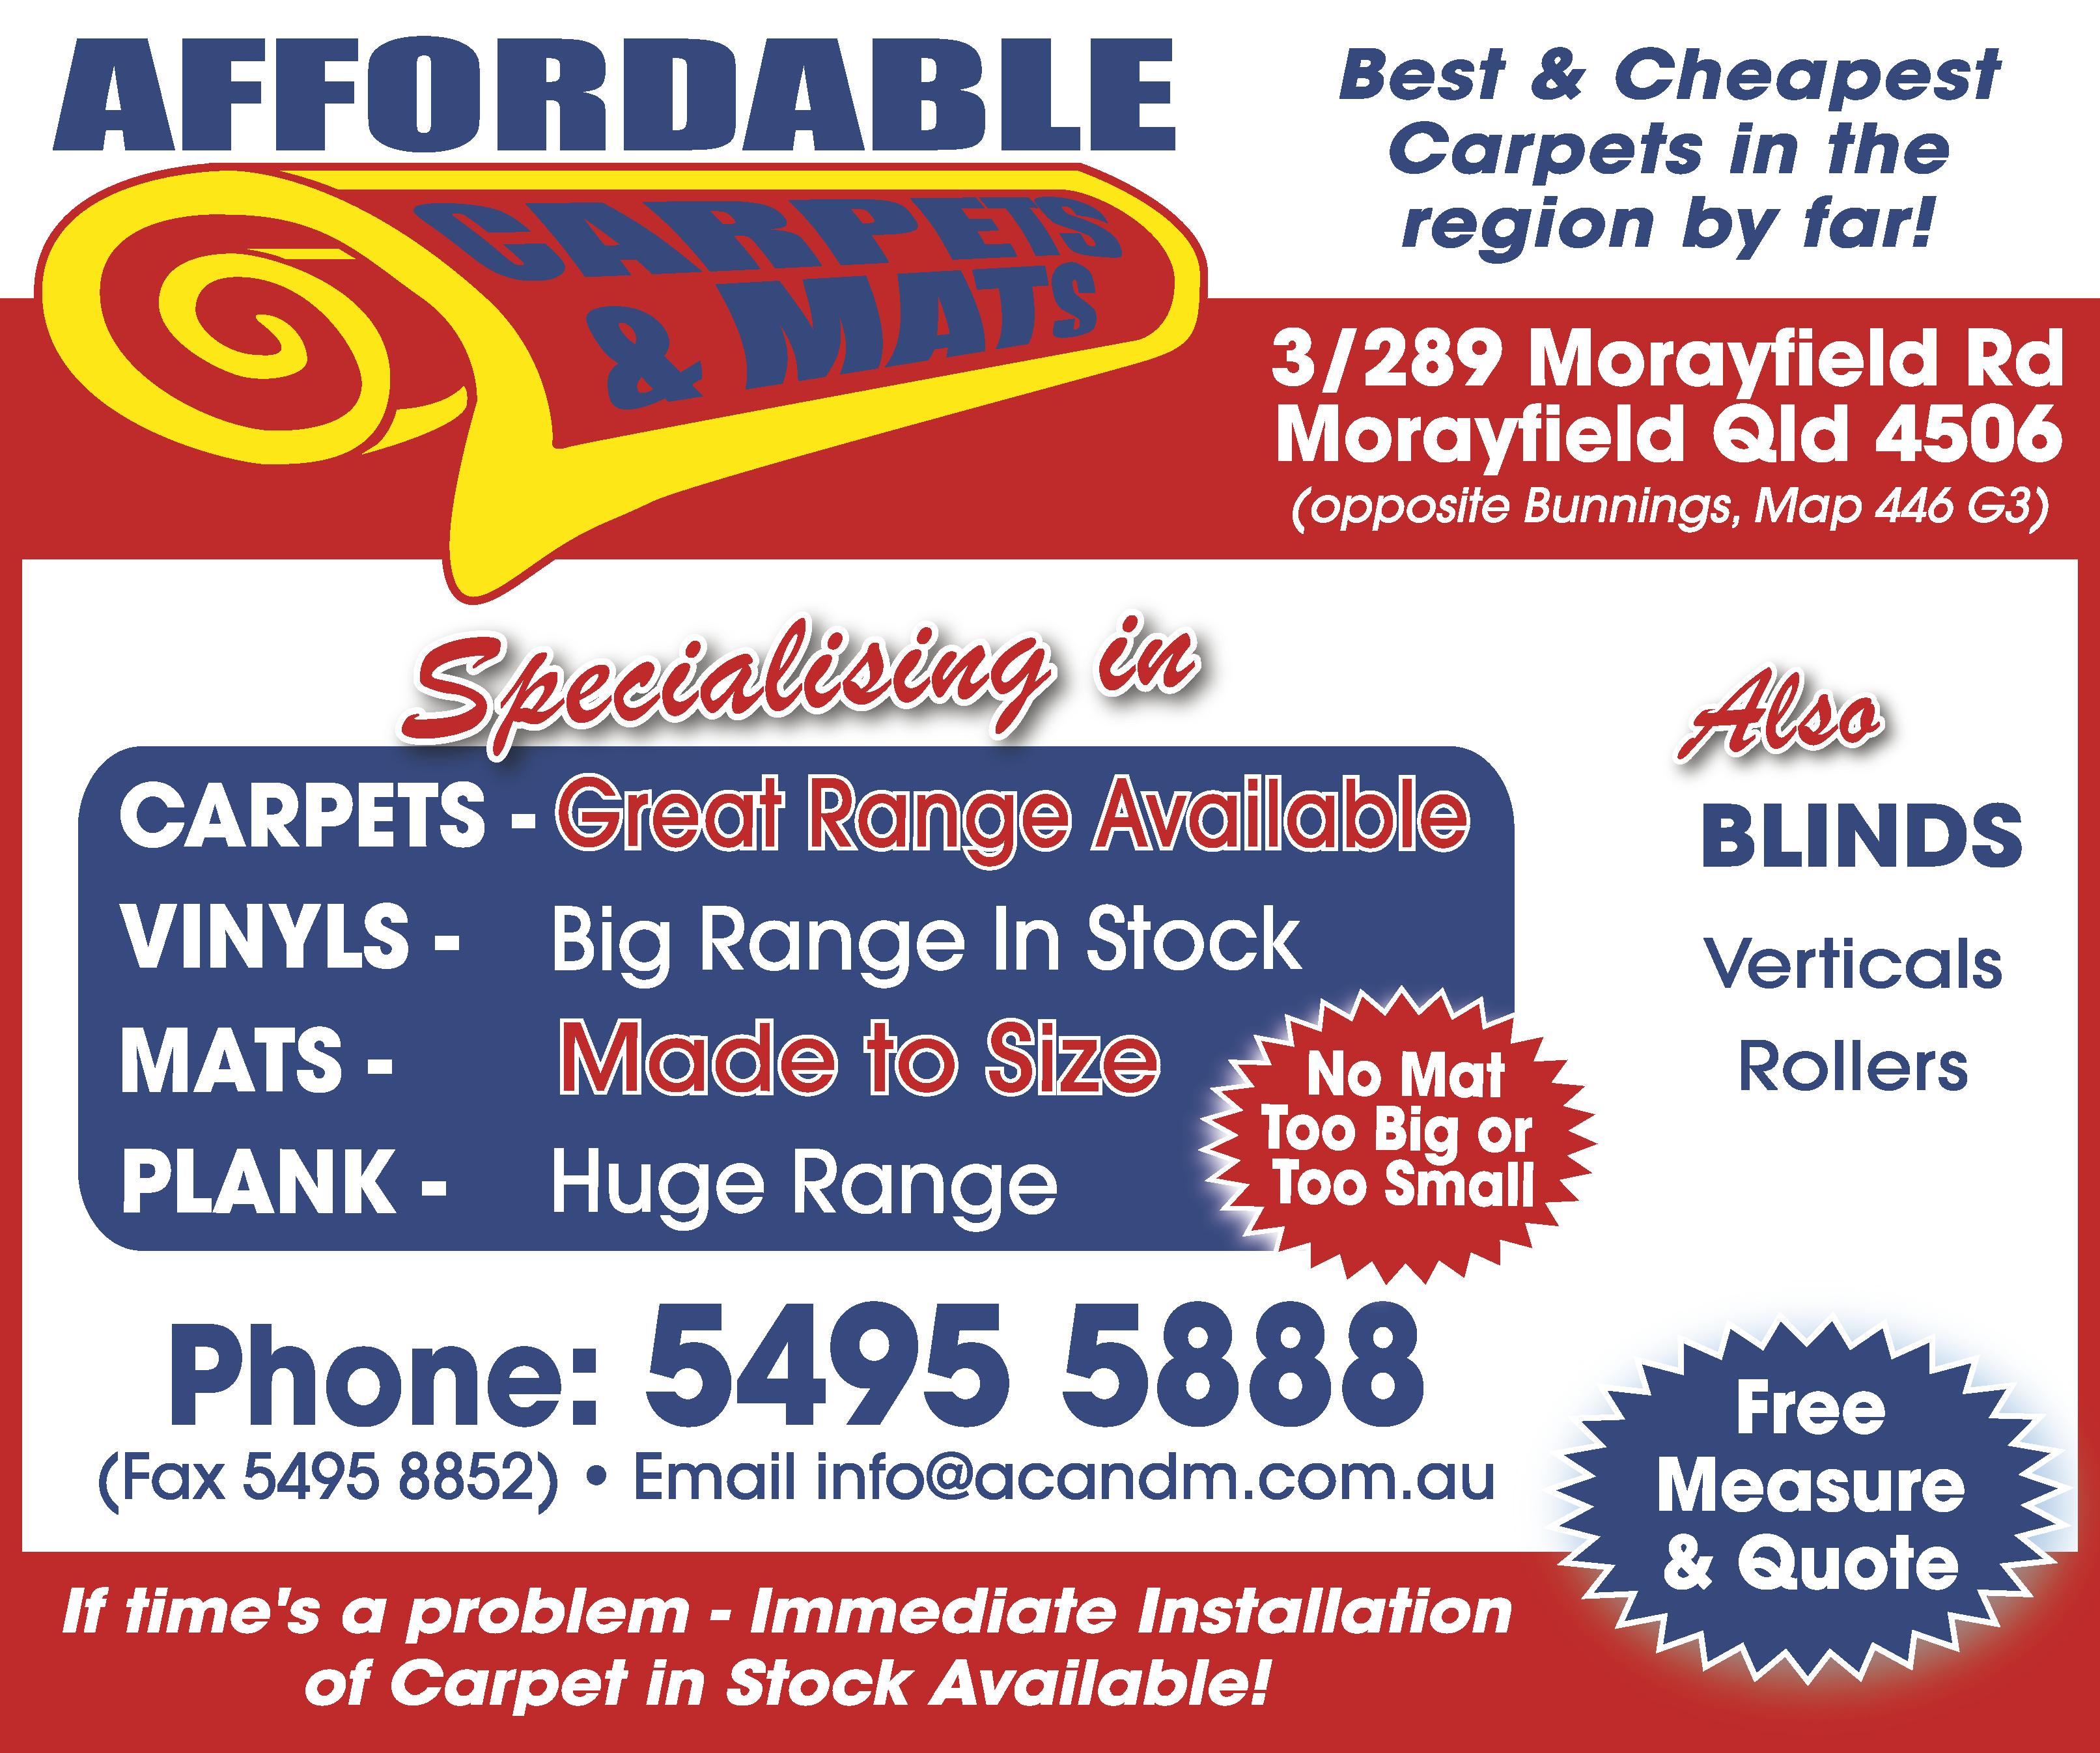 Affordable Carpets & Mats - advertisement